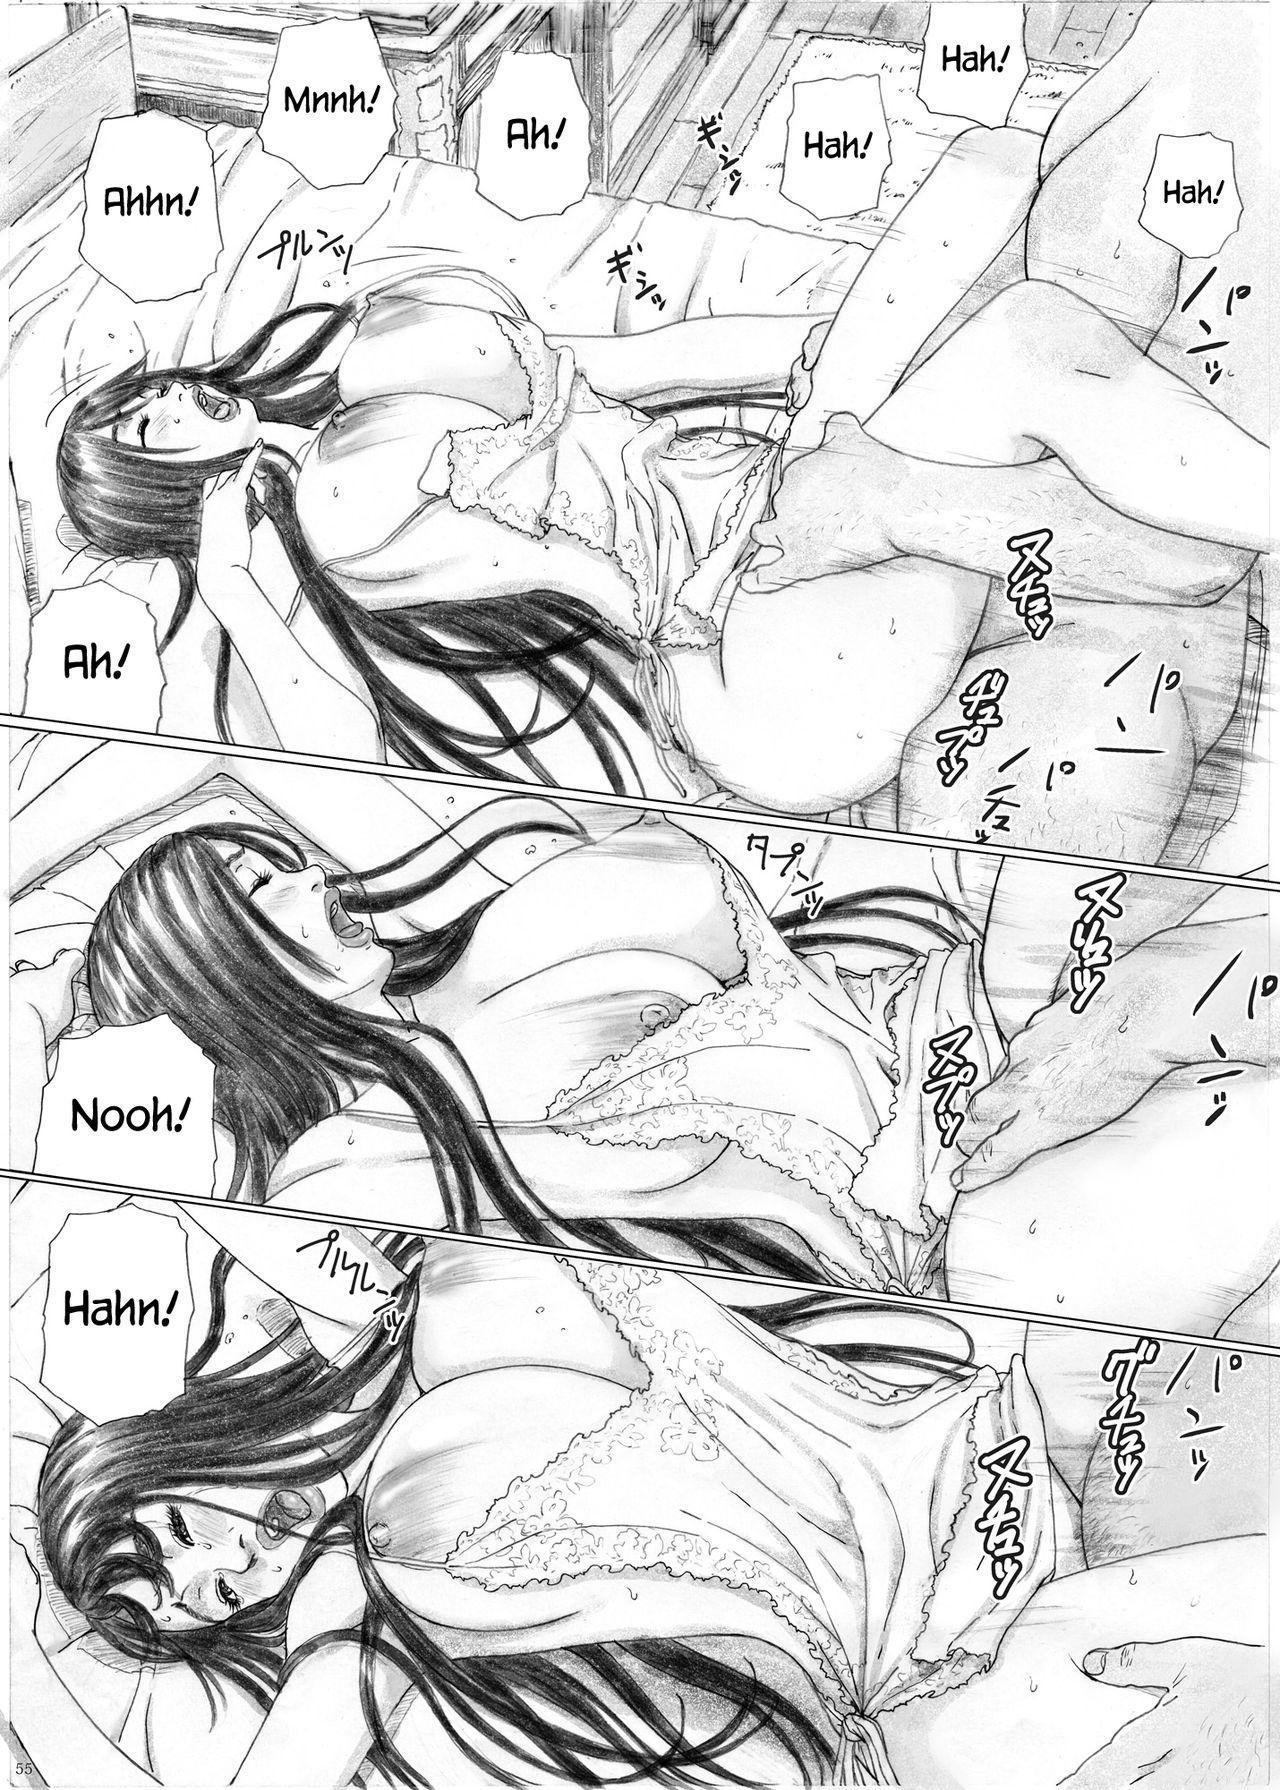 Inyoku no Sumika 1 | House of Lust 1 52